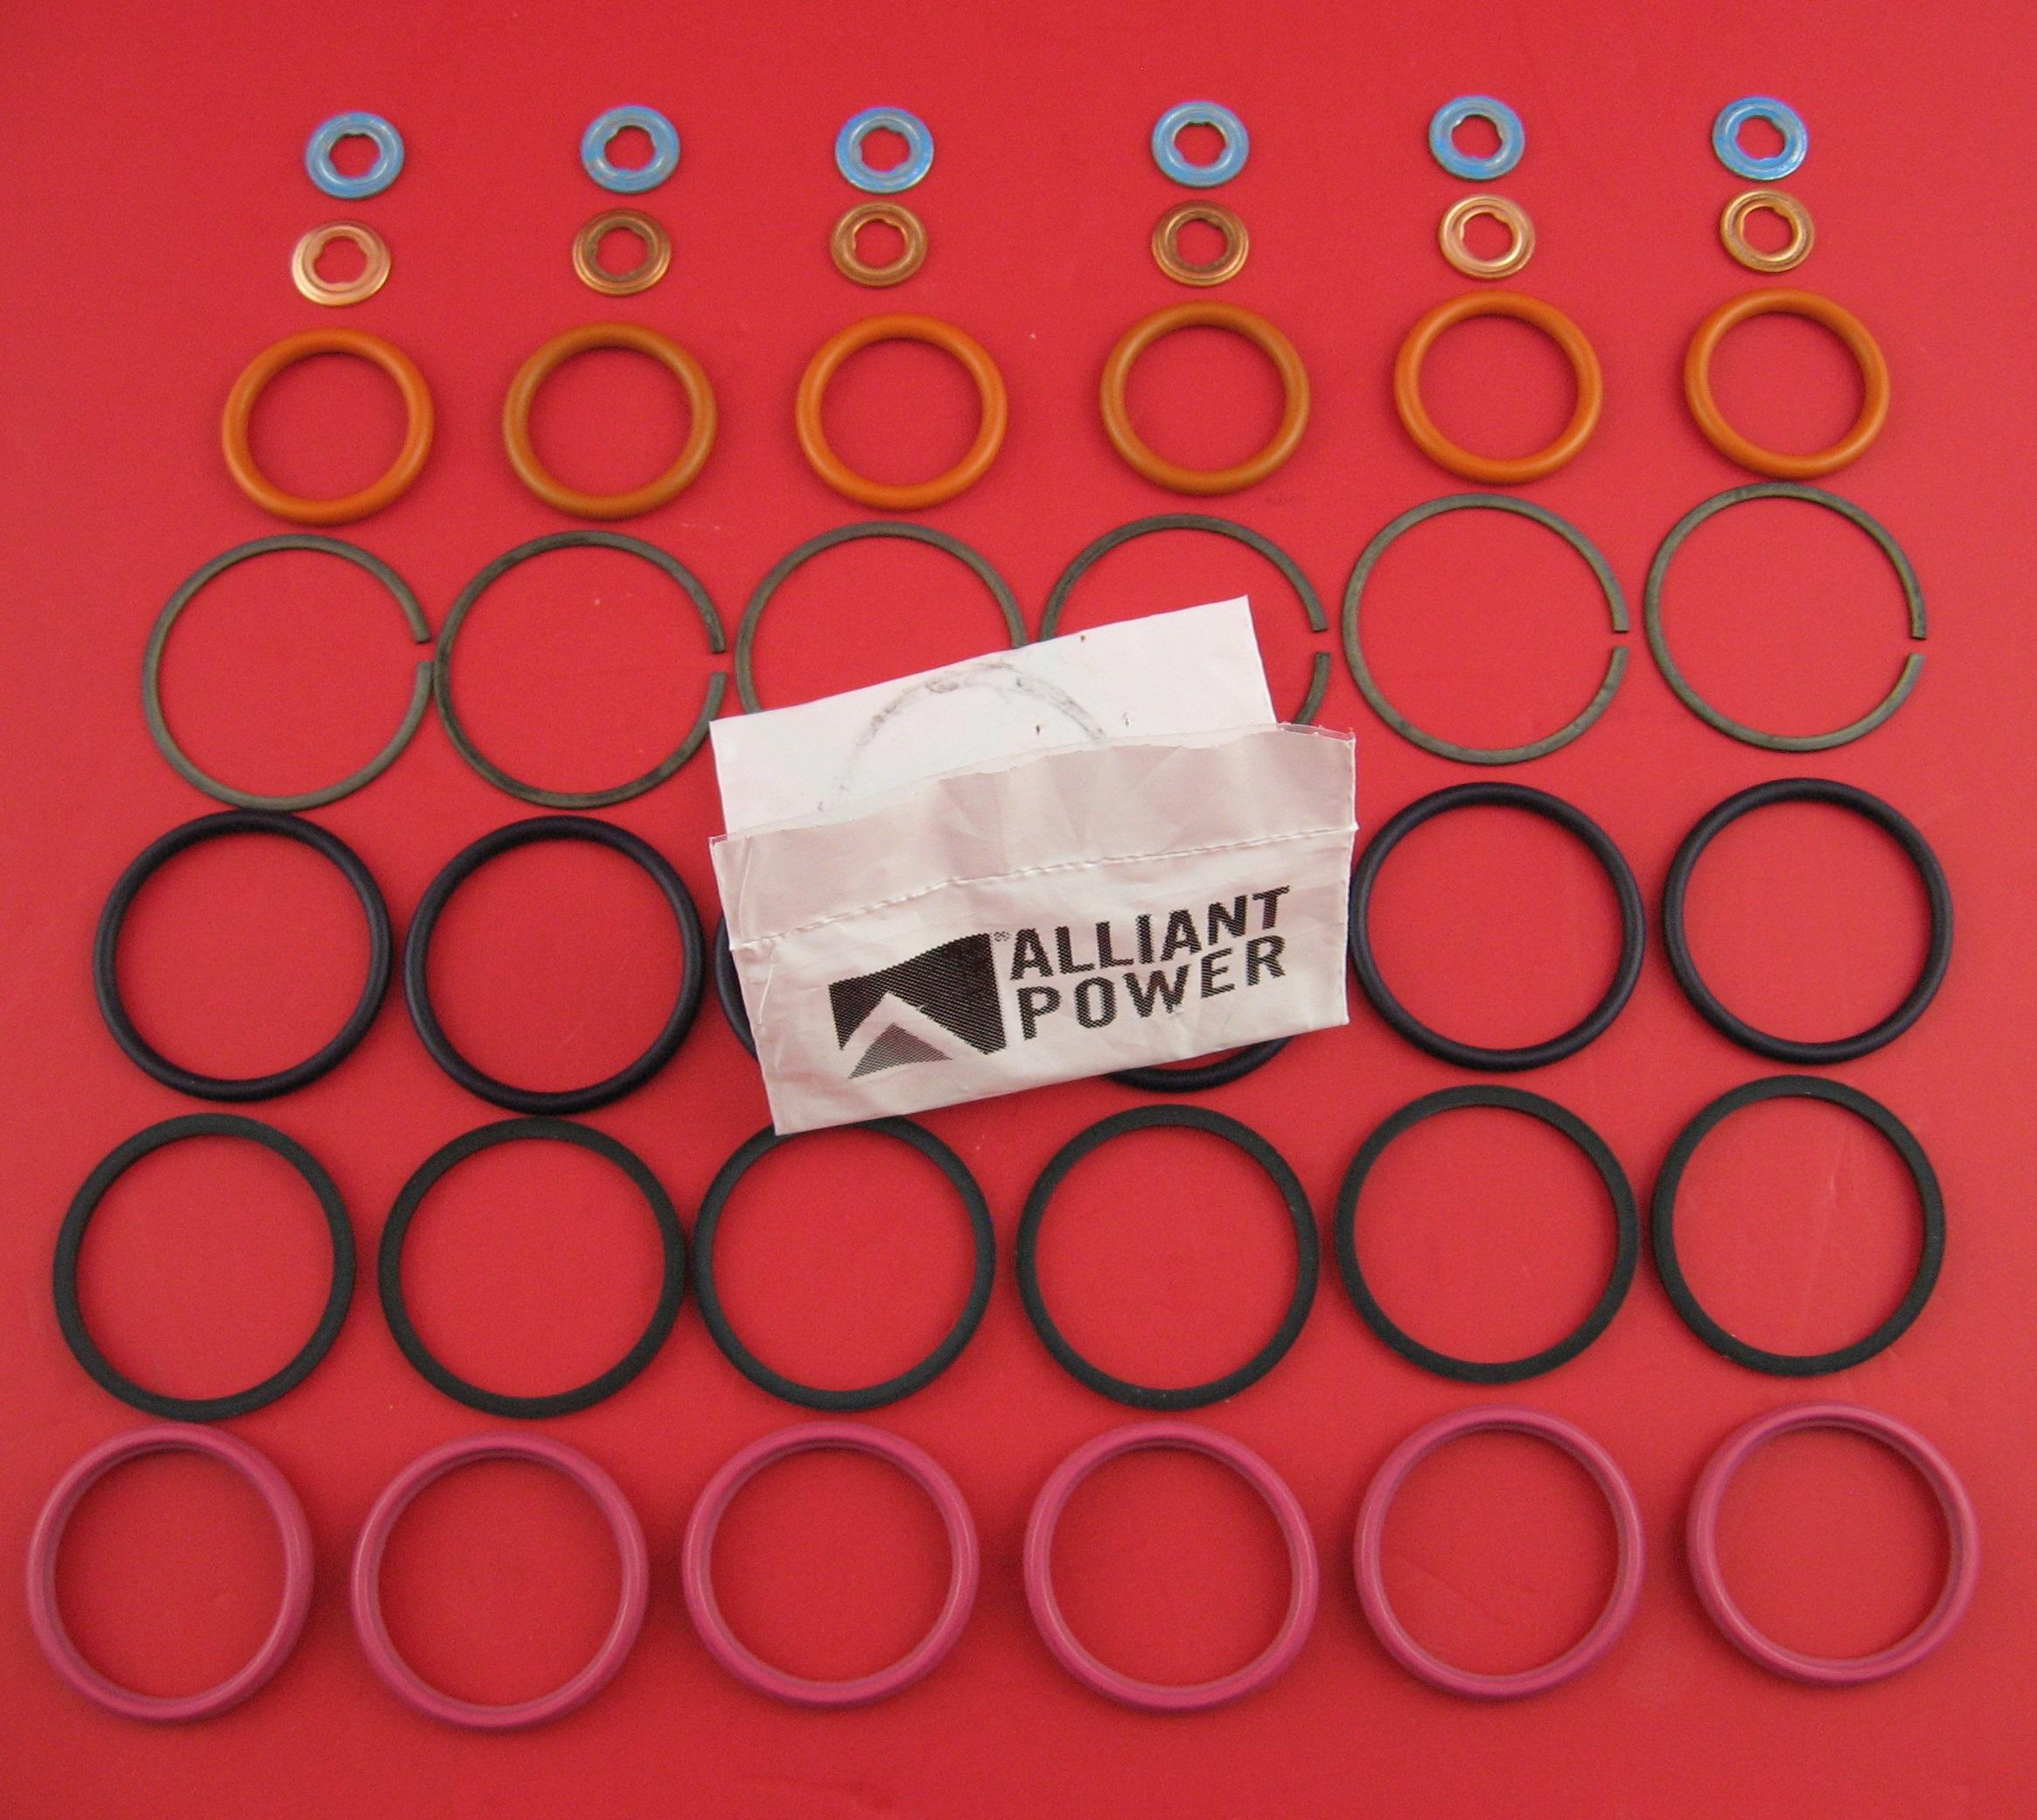 Diesel Fuel Injector Seal Kit for a Ford Powerstroke 6.0L International//Navistar